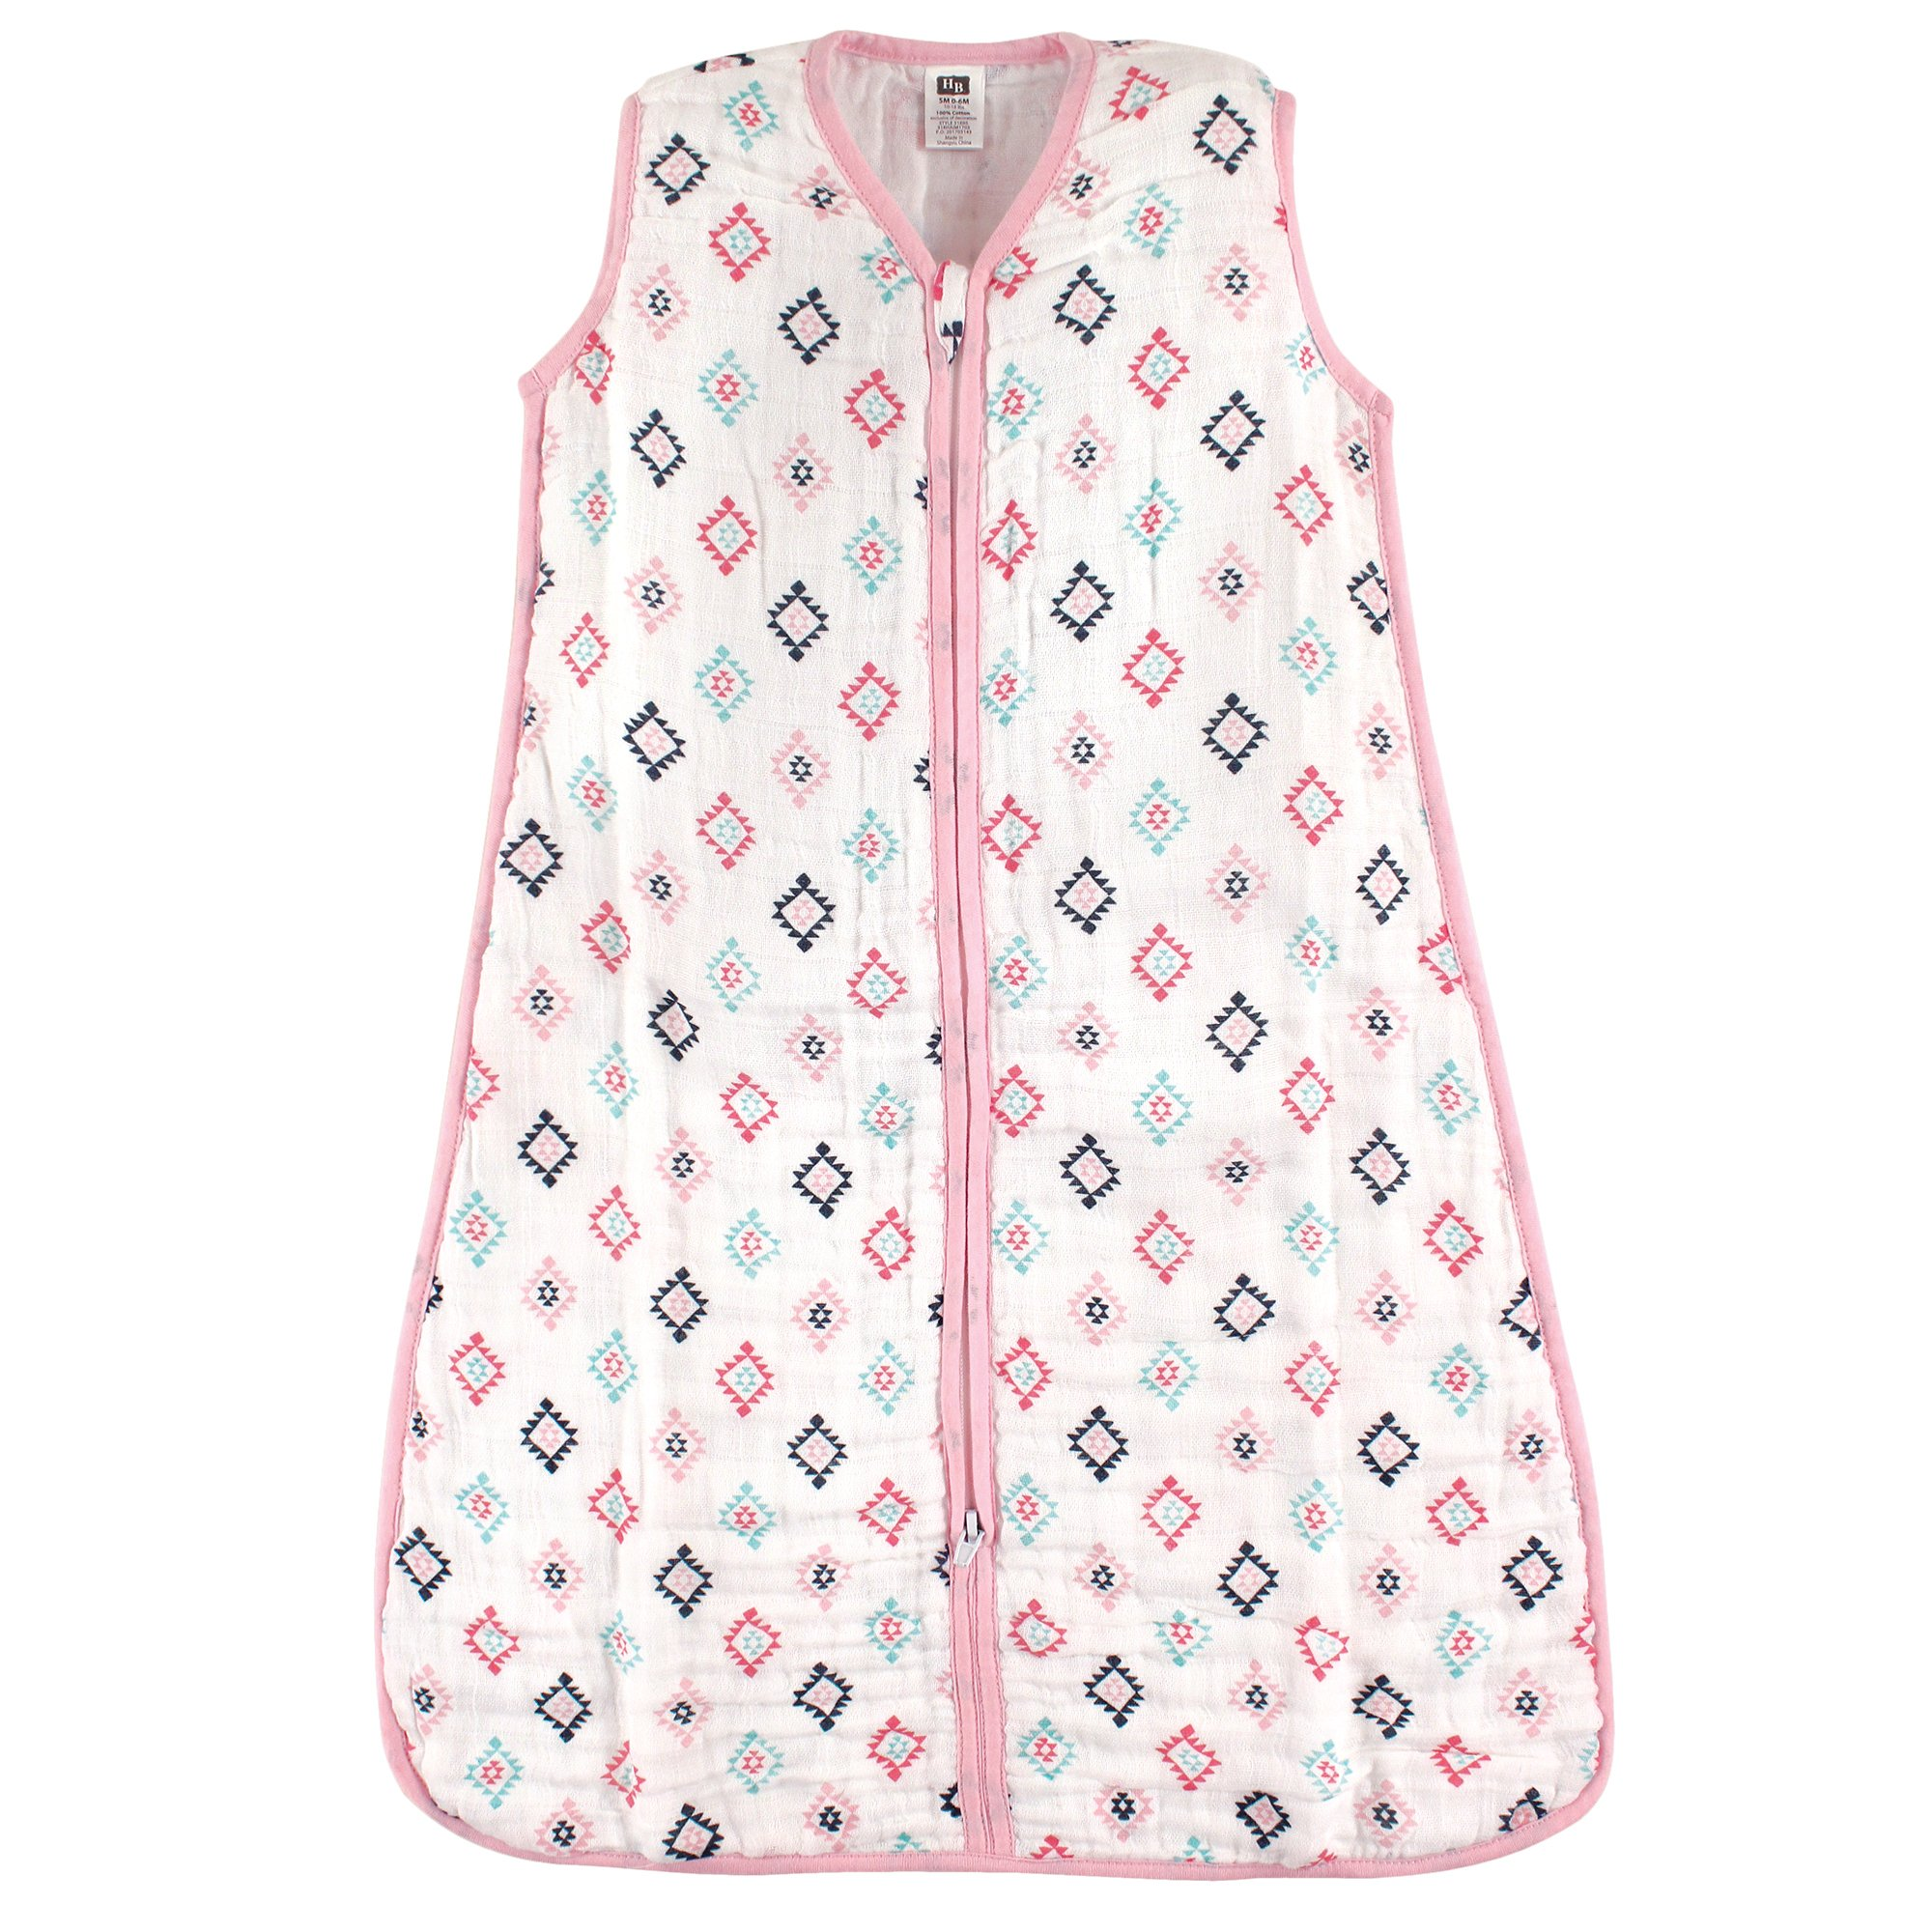 sports shoes 20477 277db Hudson Baby Unisex Baby Safe Sleep Wearable Muslin Sleeping Bag, Girl Aztec  1-Pack, 18-24 Months